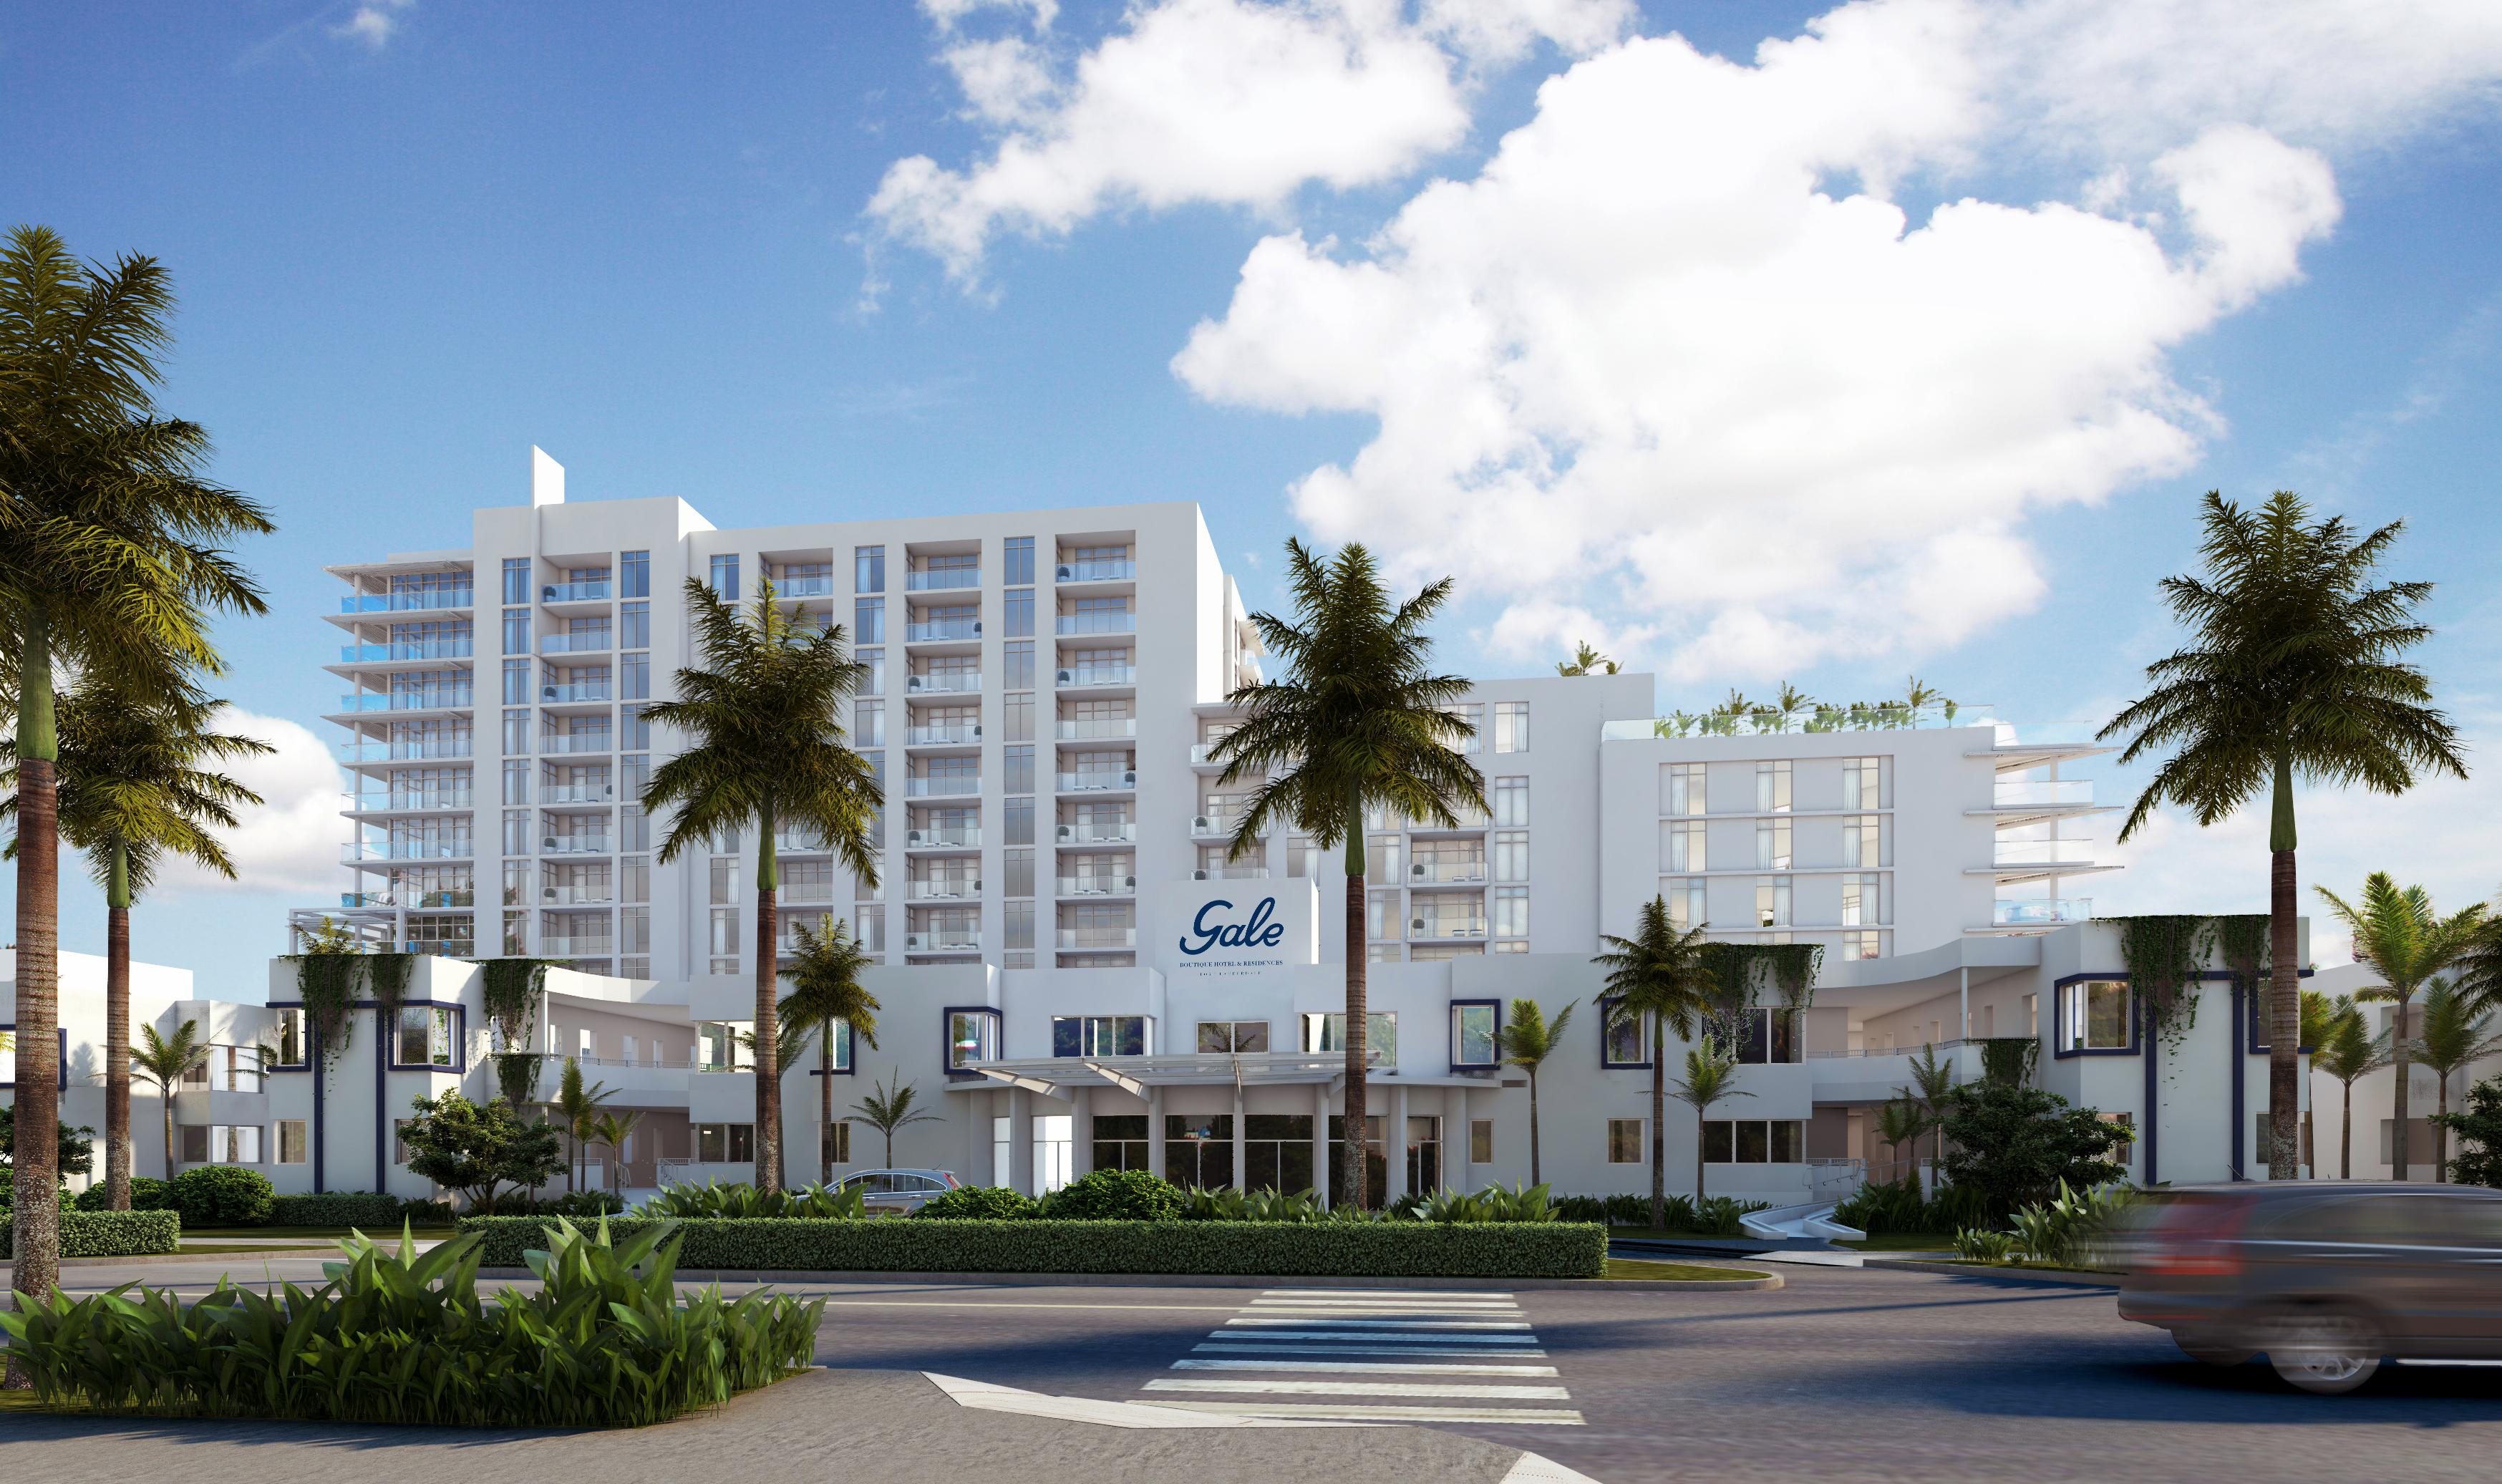 Apartamento para Venda às 401 Bayshore Dr #502 401 Bayshore Dr 502 Fort Lauderdale, Florida, 33304 Estados Unidos